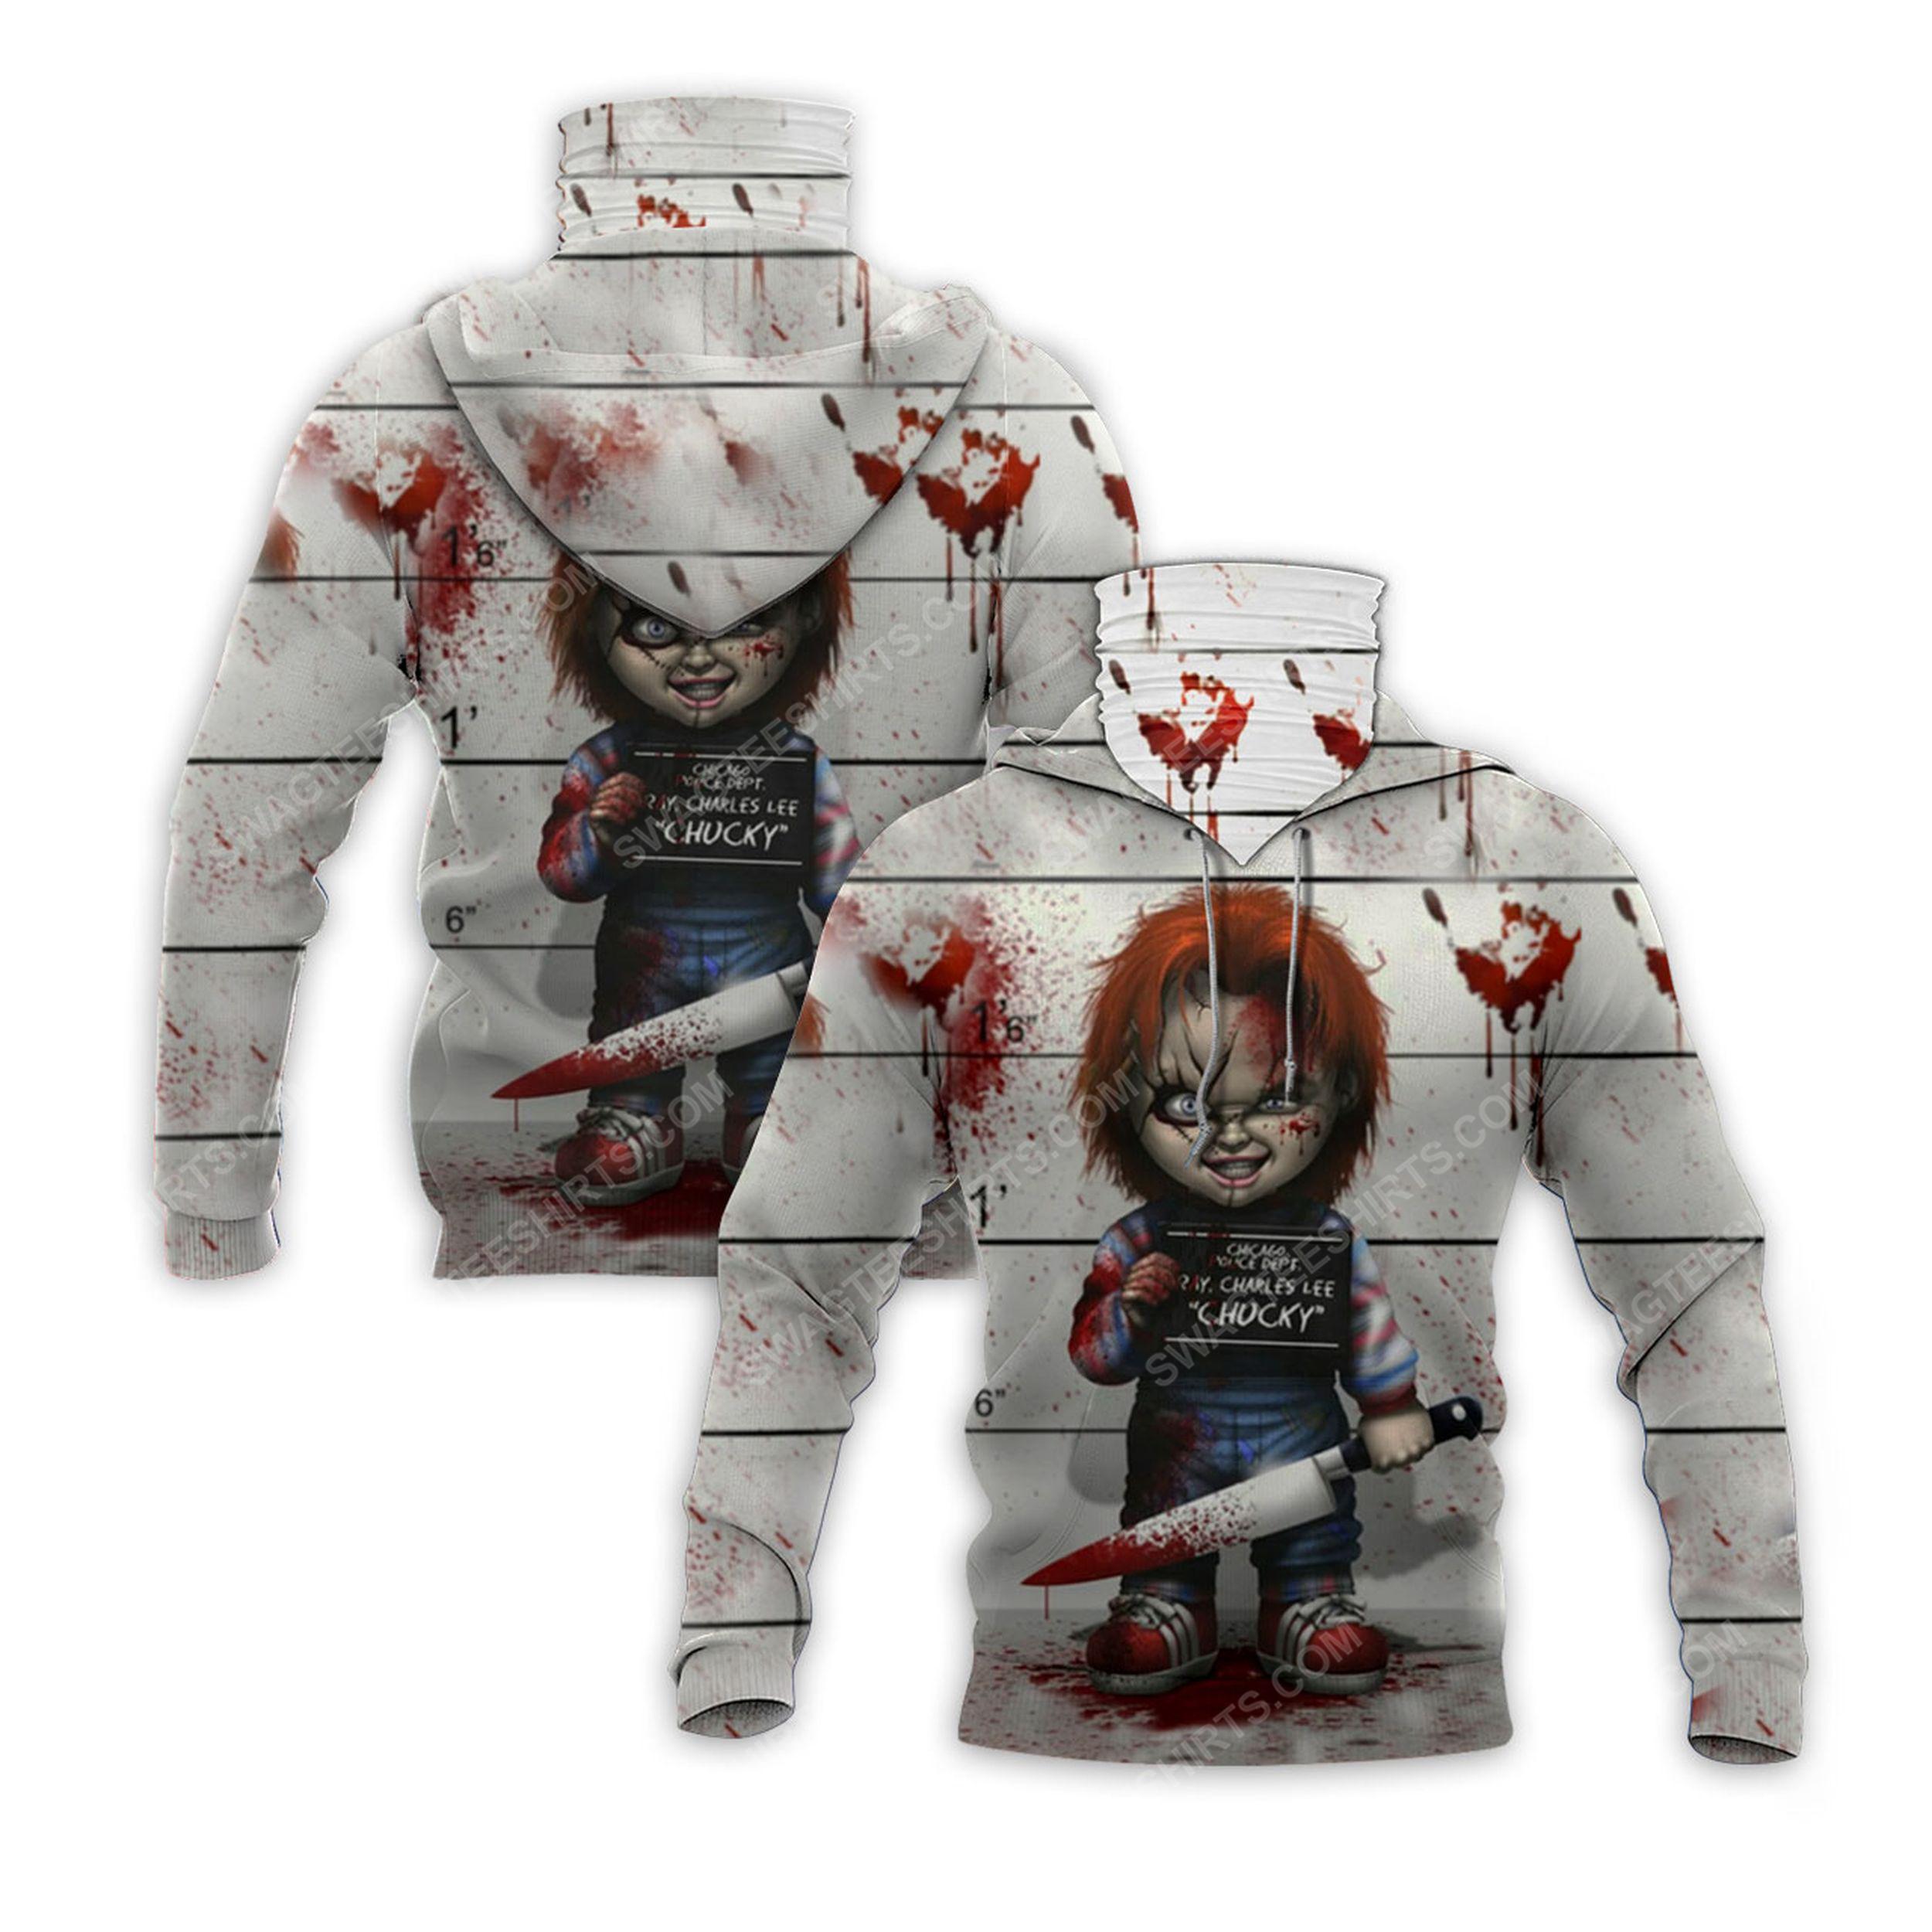 Horror movie chucky doll for halloween full print mask hoodie 2(1)